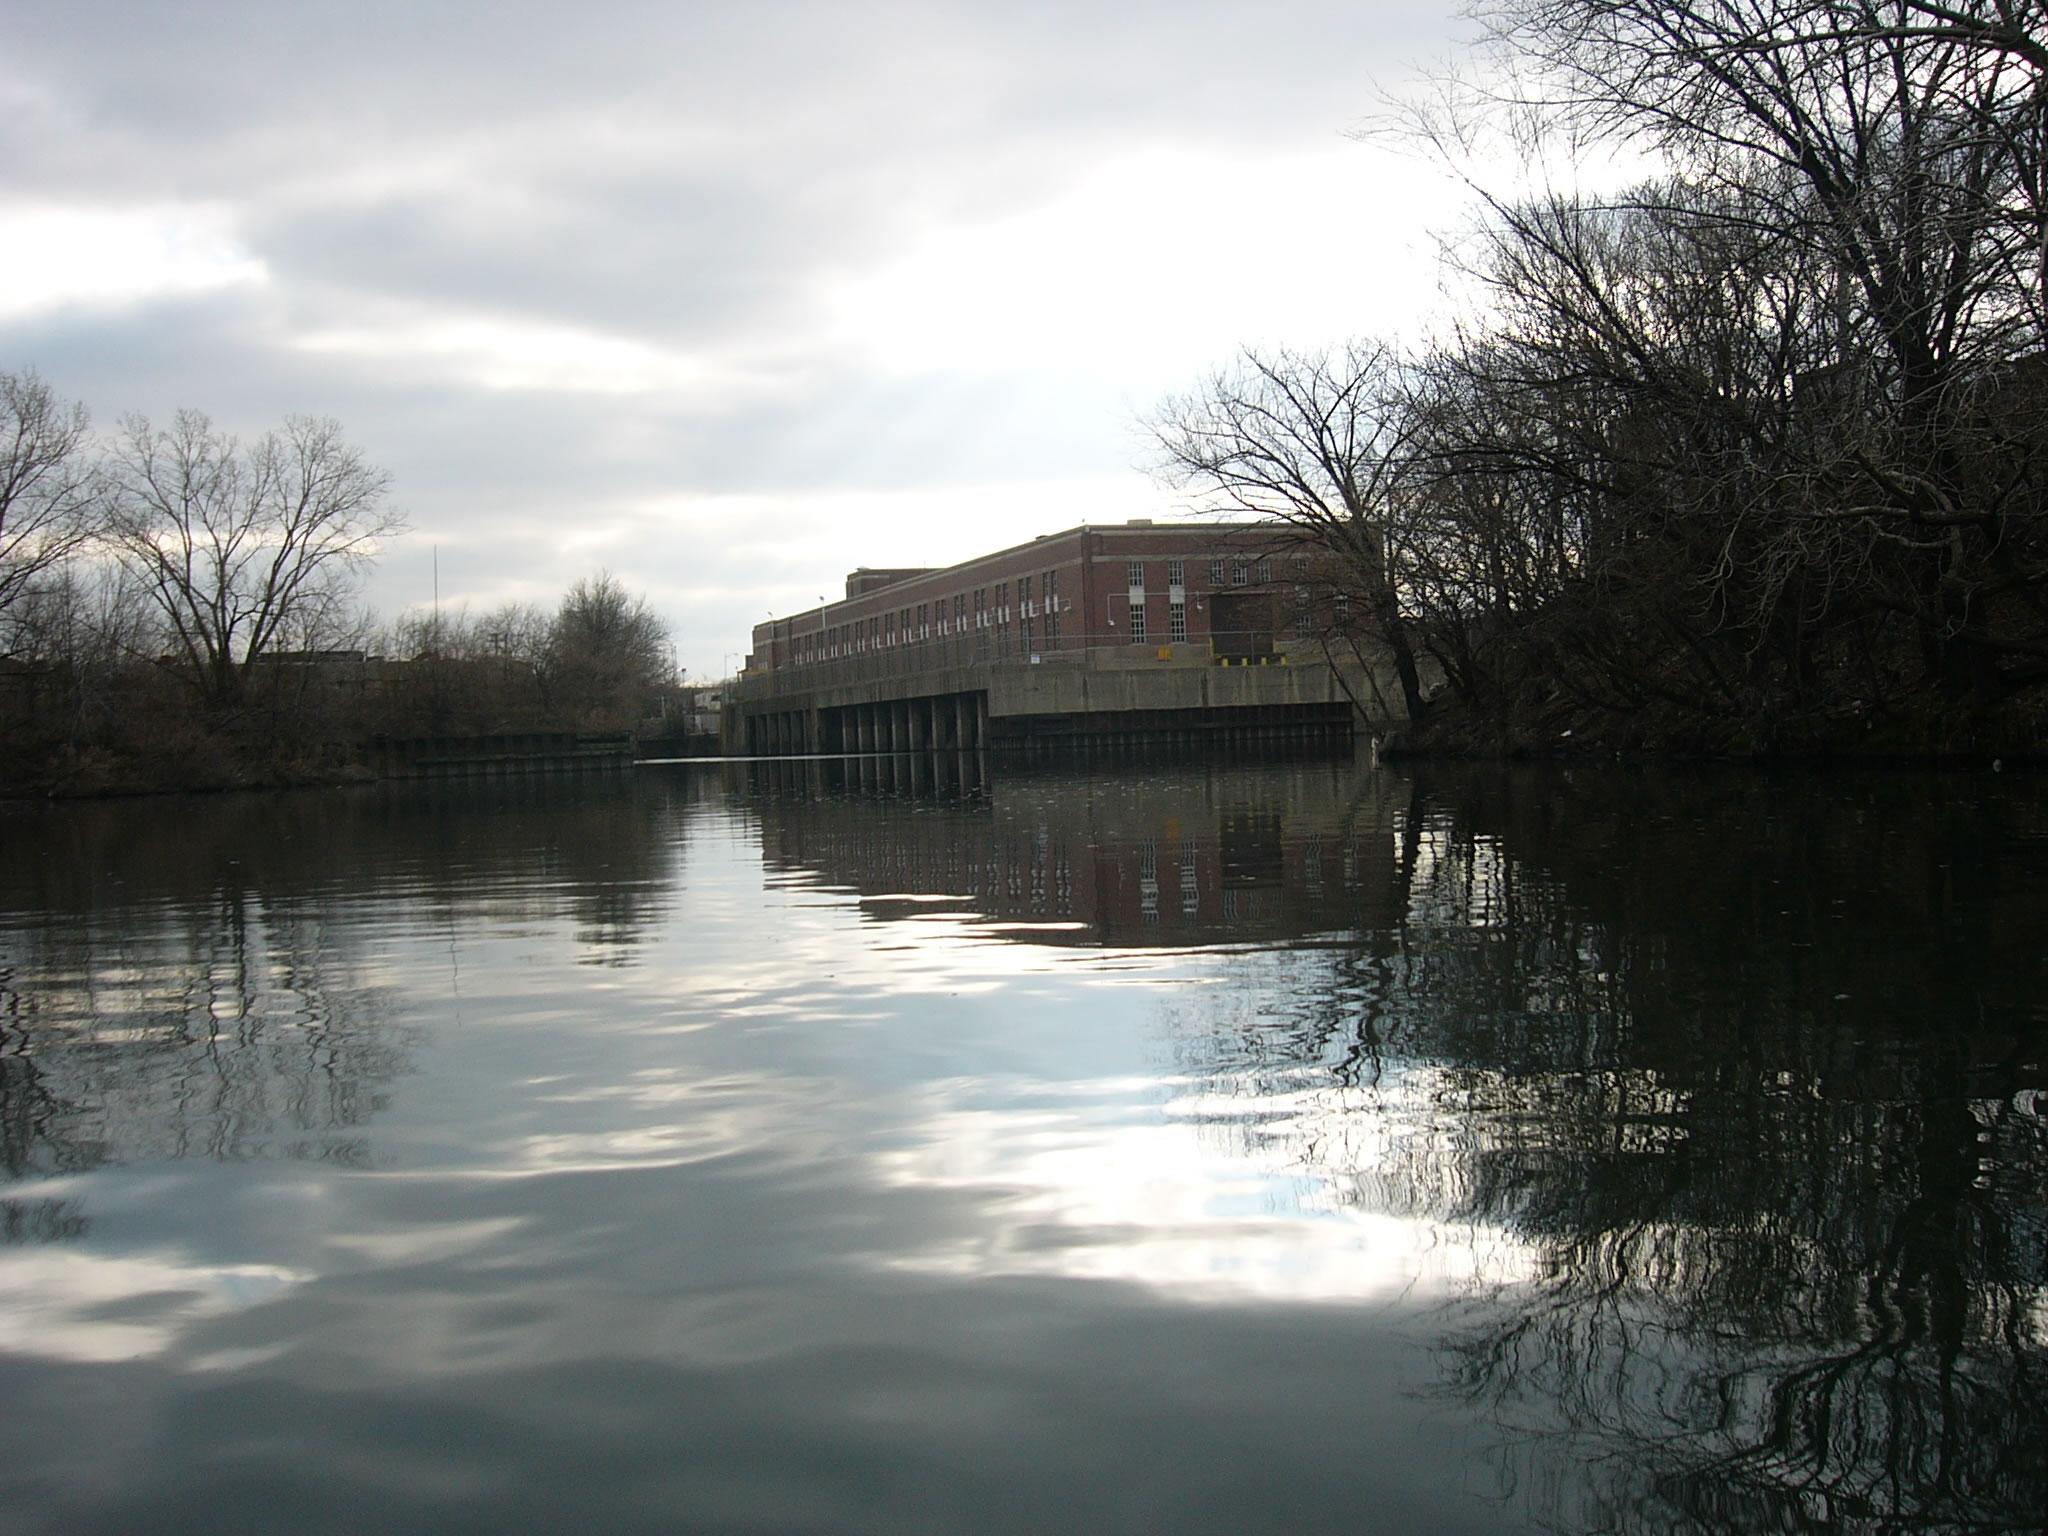 Bubbly Creek - Wikipedia